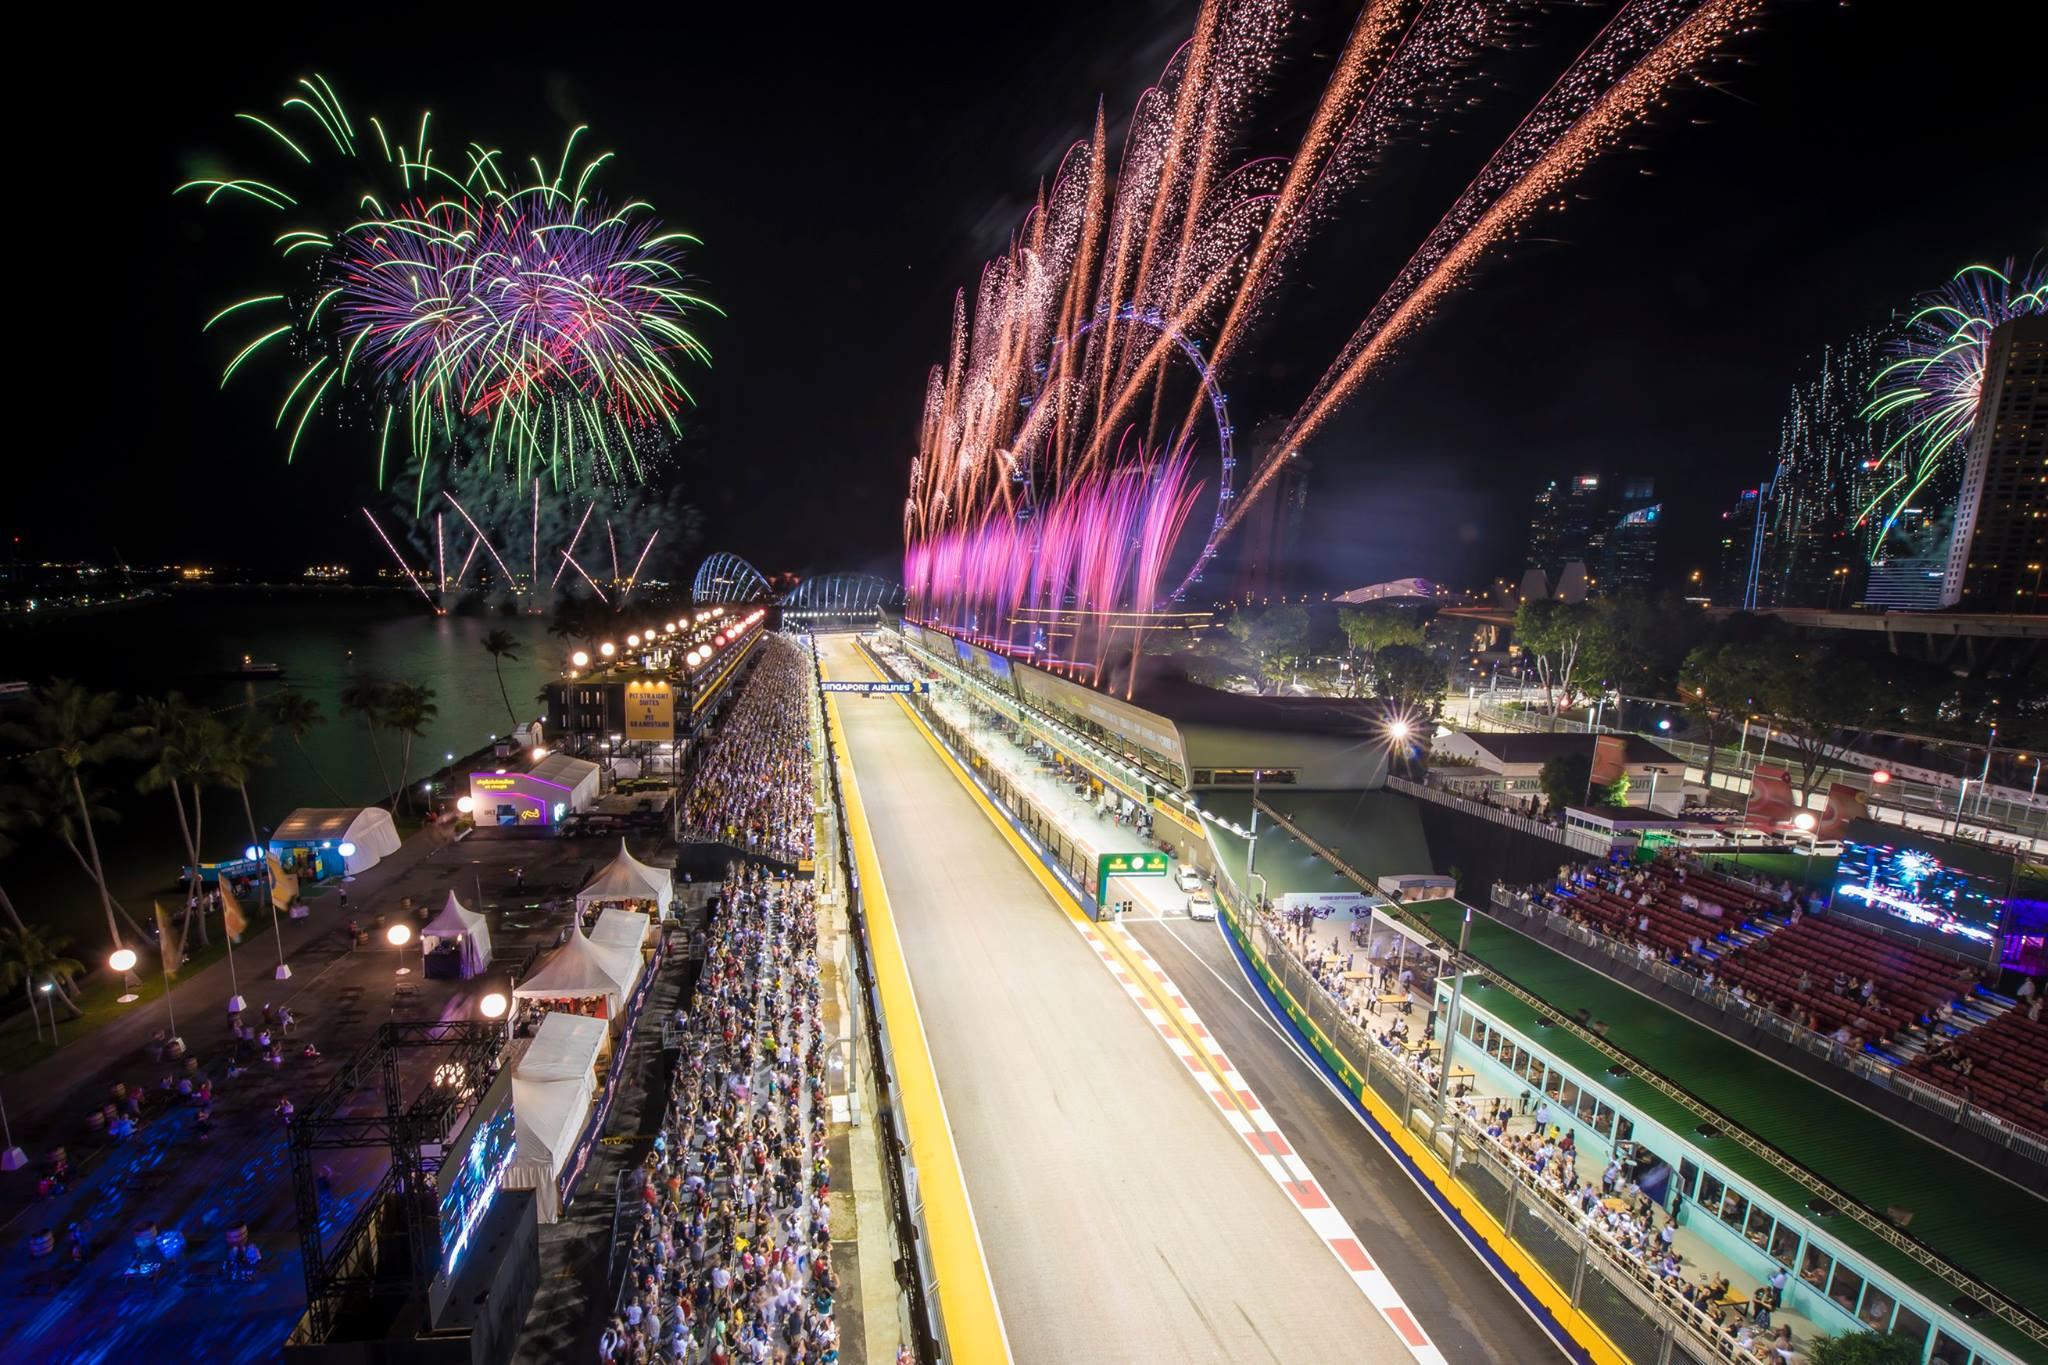 F1 Singapore 2018 - Fireworks